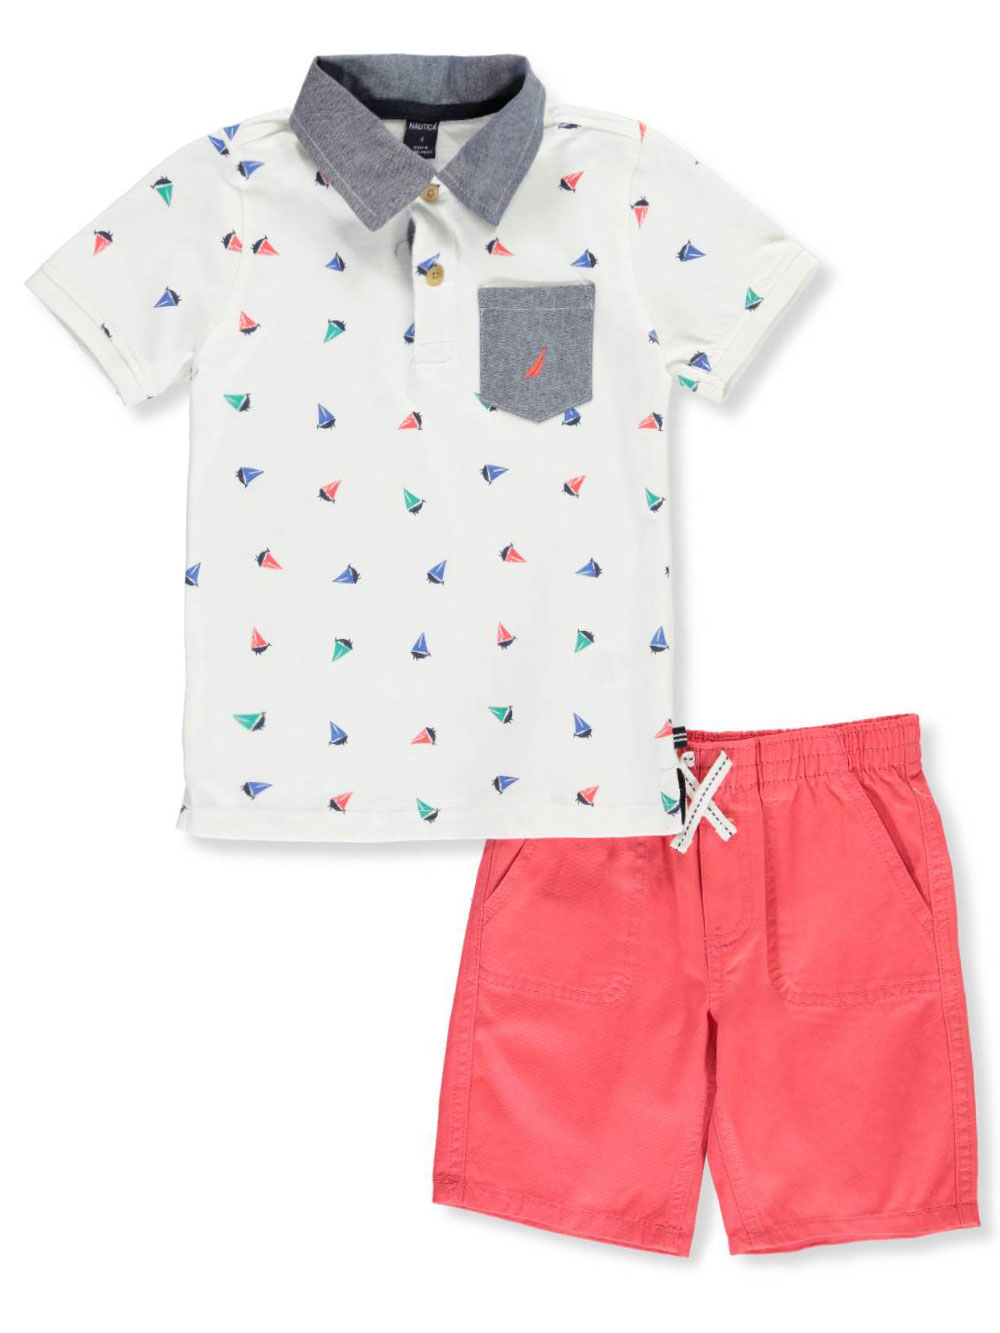 Nautica Childrens Apparel Baby Boys Four Piece Knit Set W// Hat and